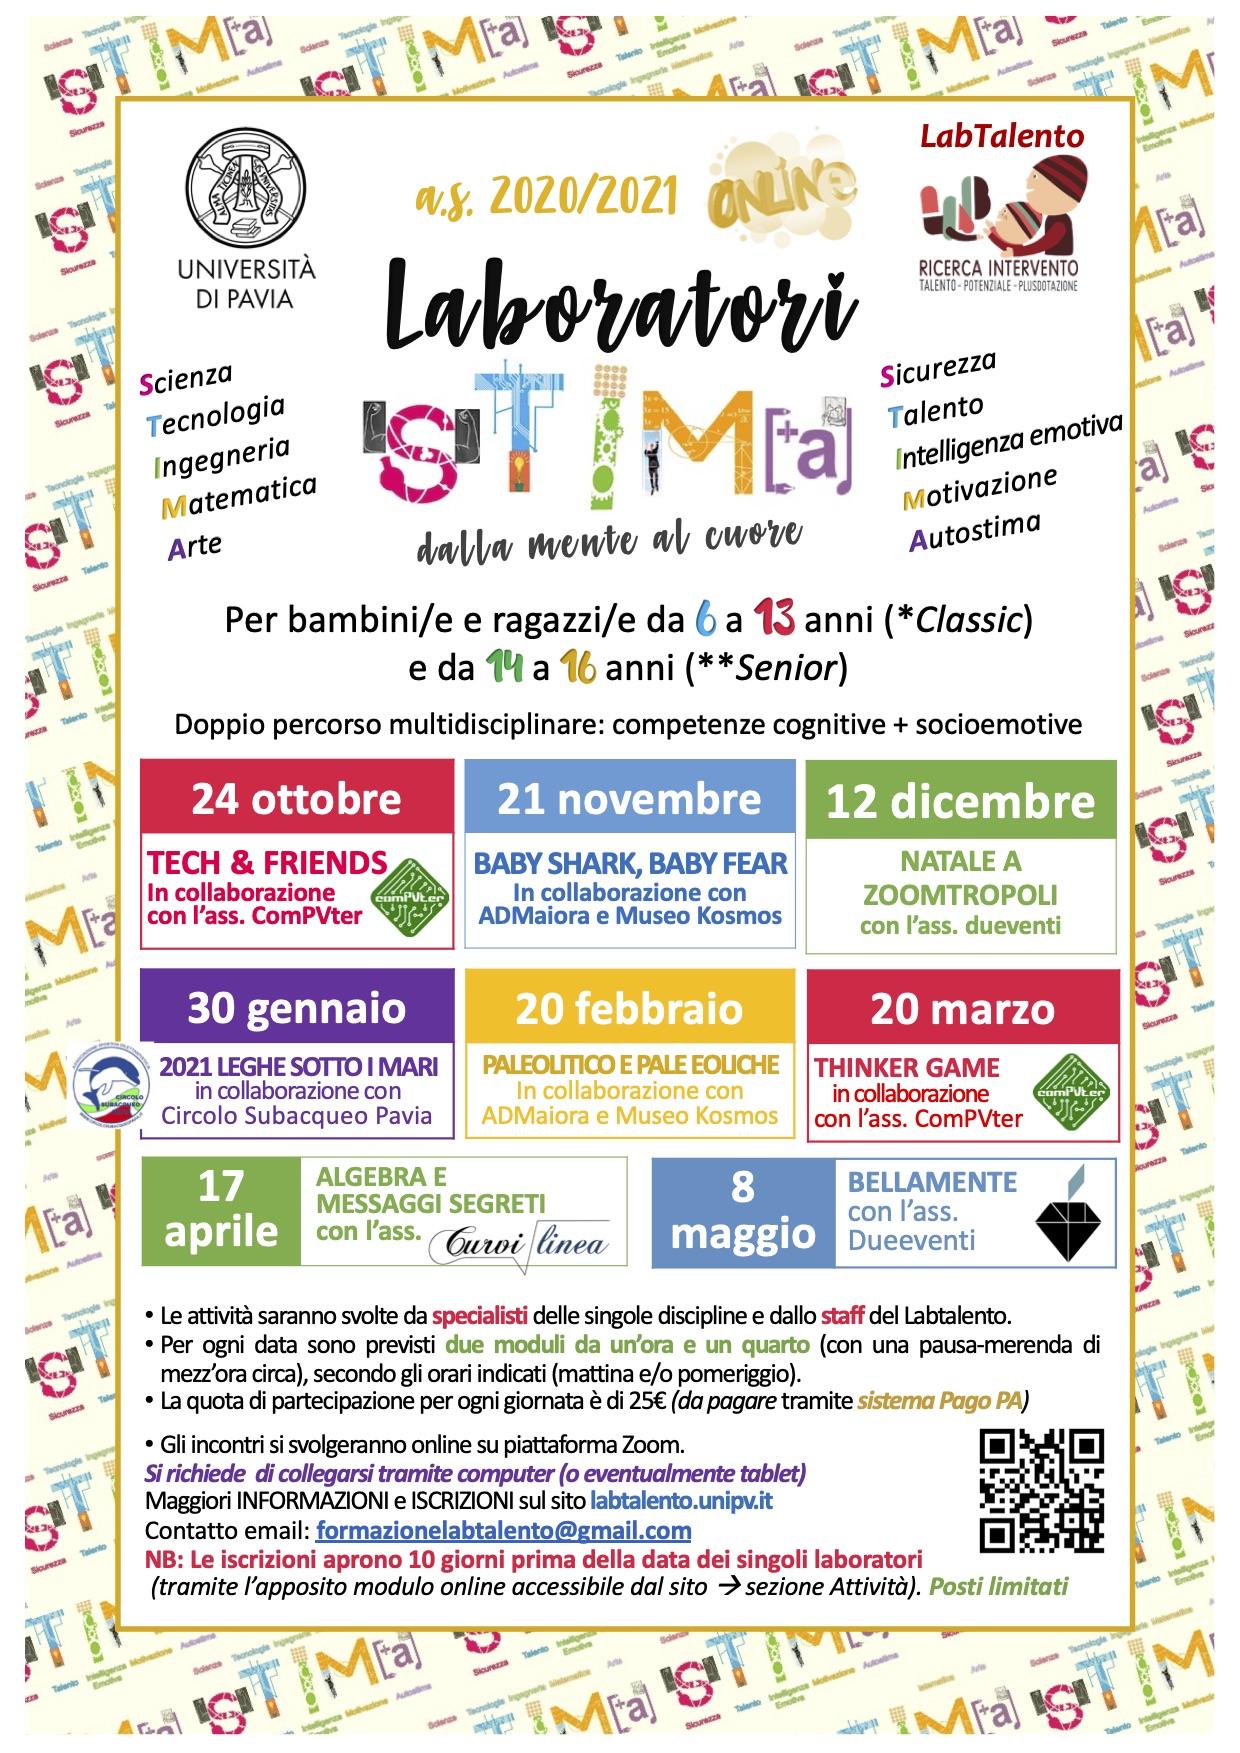 Locandina Laboratori STIMA as2020-21aprile